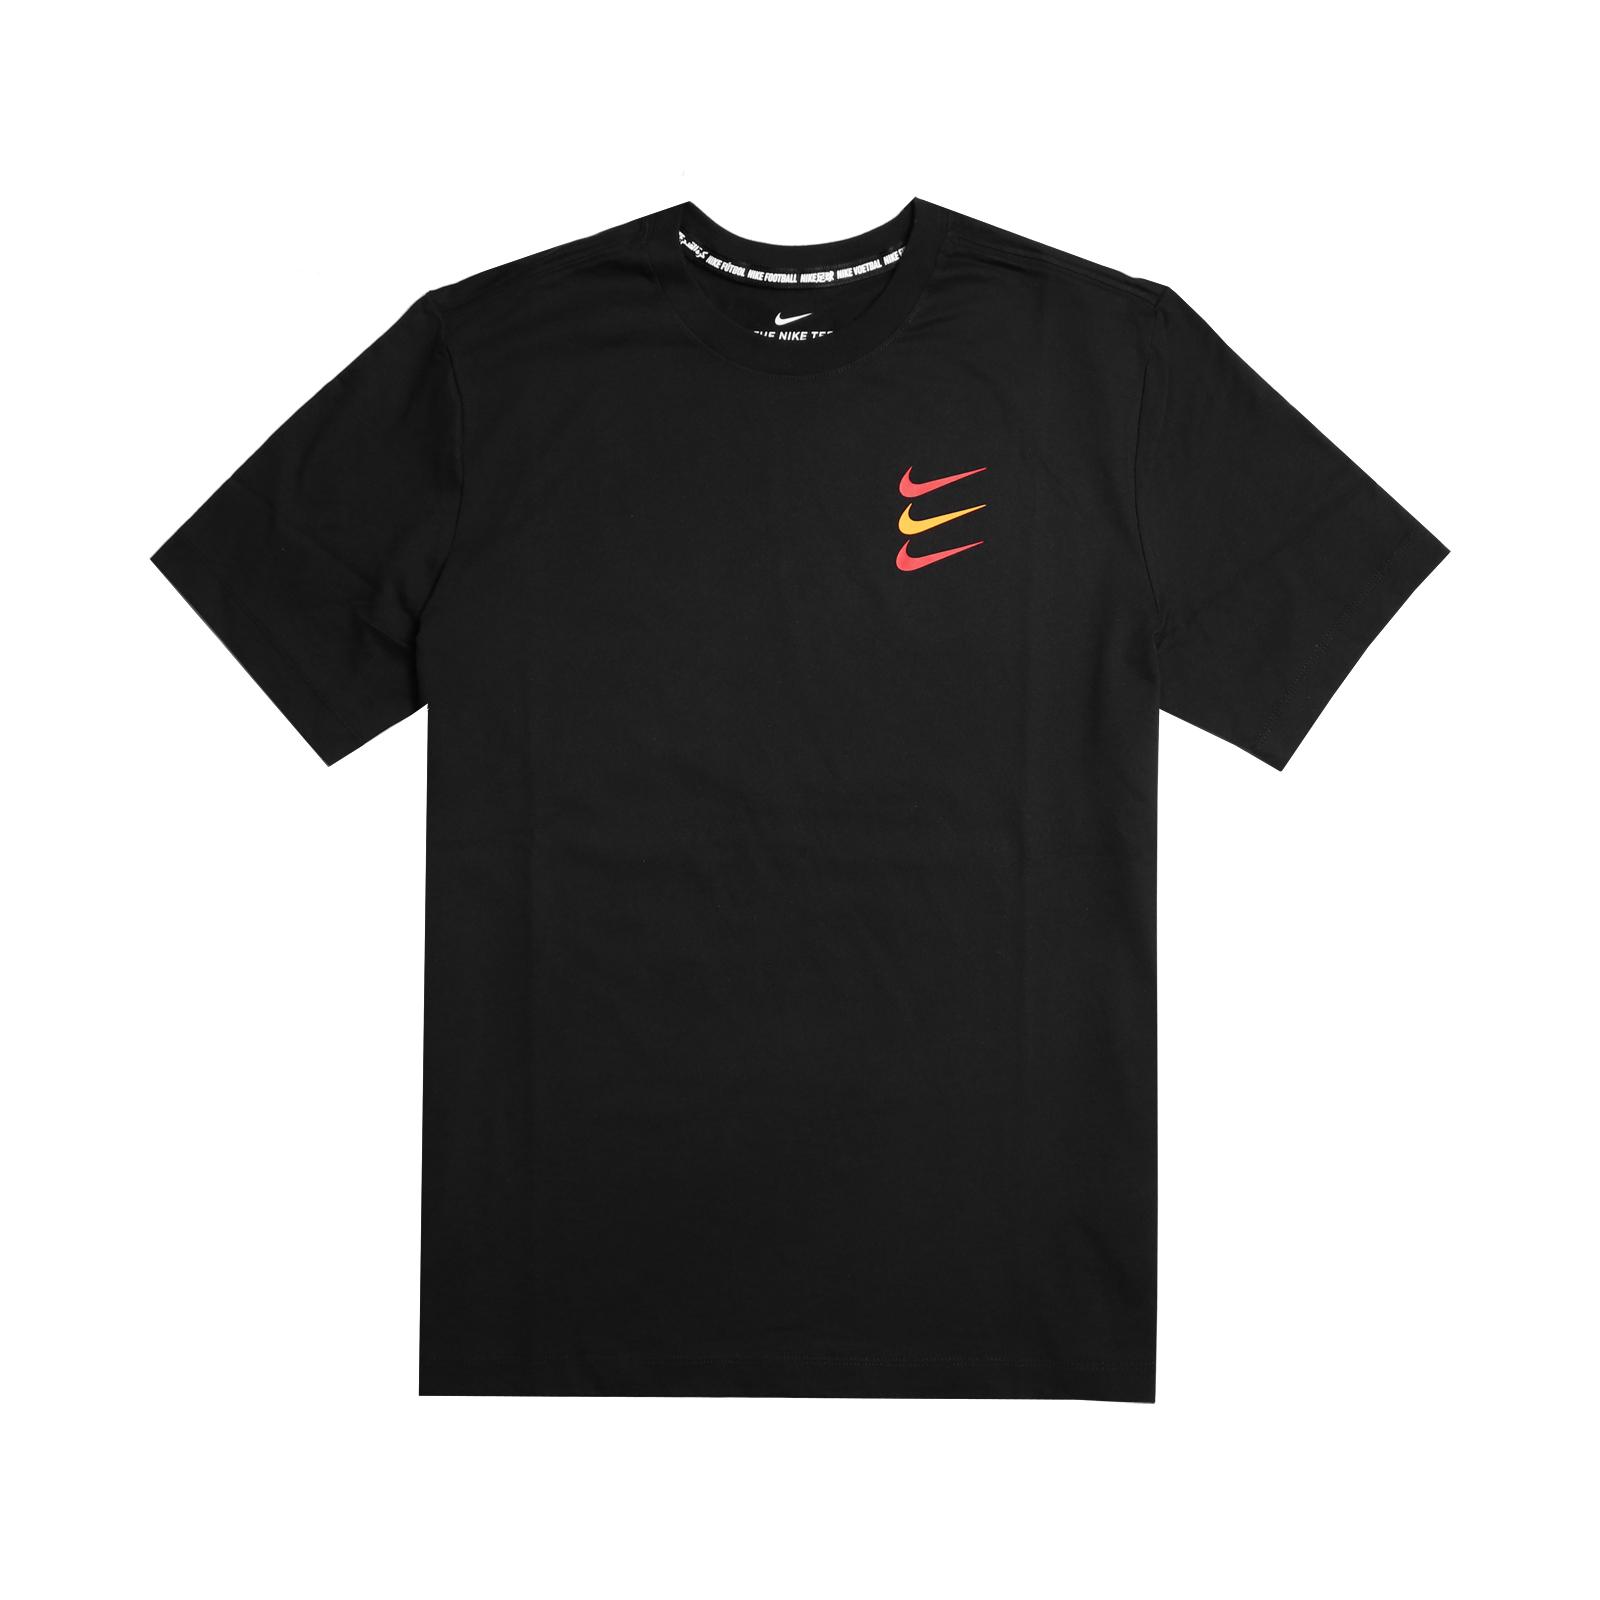 Nike T恤 FC Football T-Shirt 男款 足球 運動休閒 圓領 棉質 三勾 基本款 黑 紅 CT8432010 CT8432-010